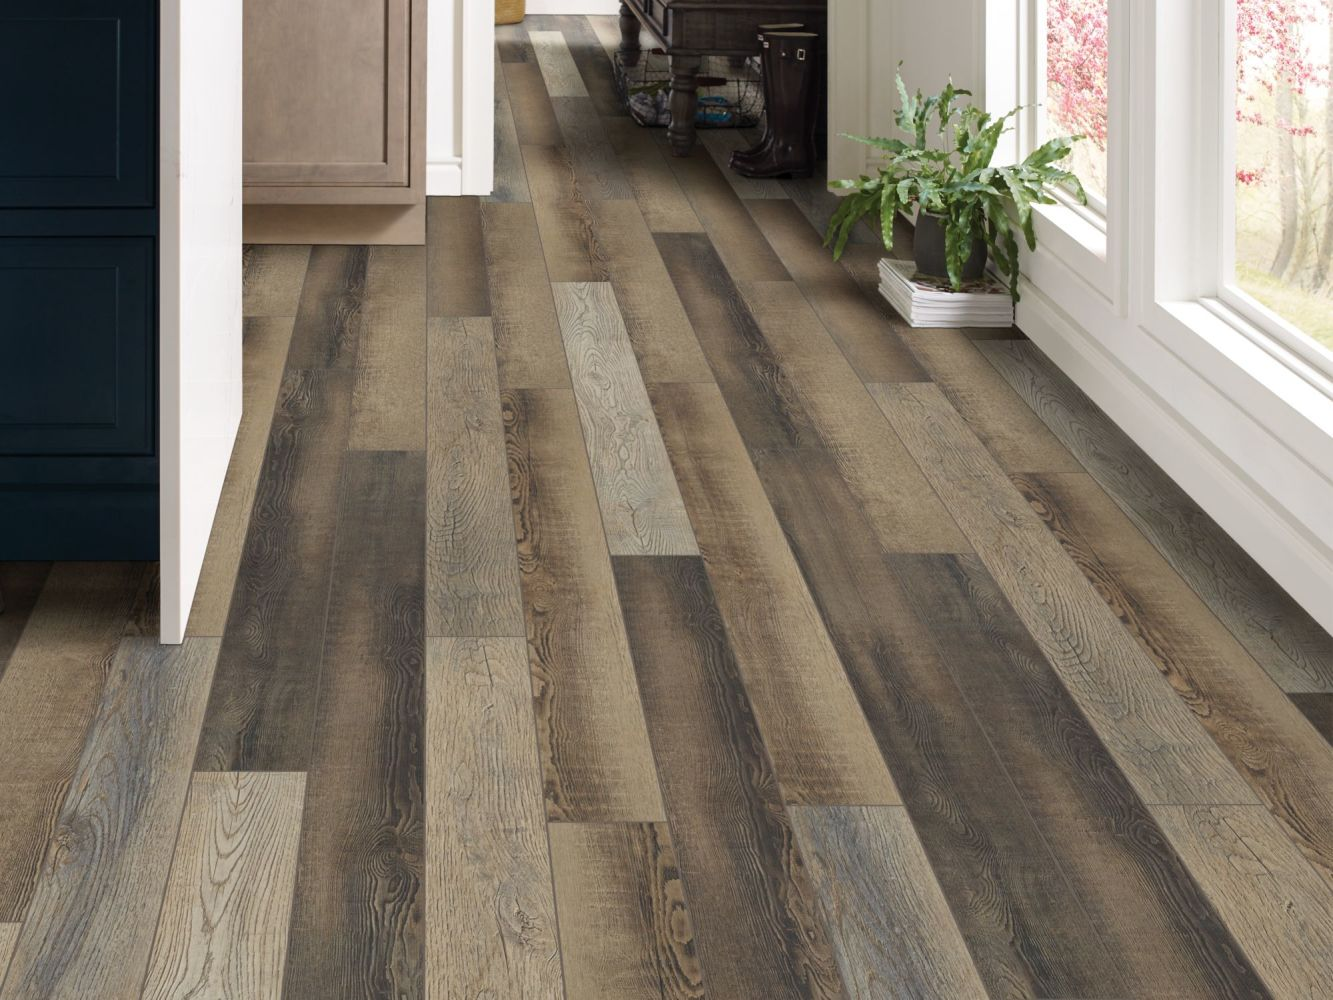 Shaw Floors Vinyl Residential Grand Marais5″plus Brush Oak 07033_505GA